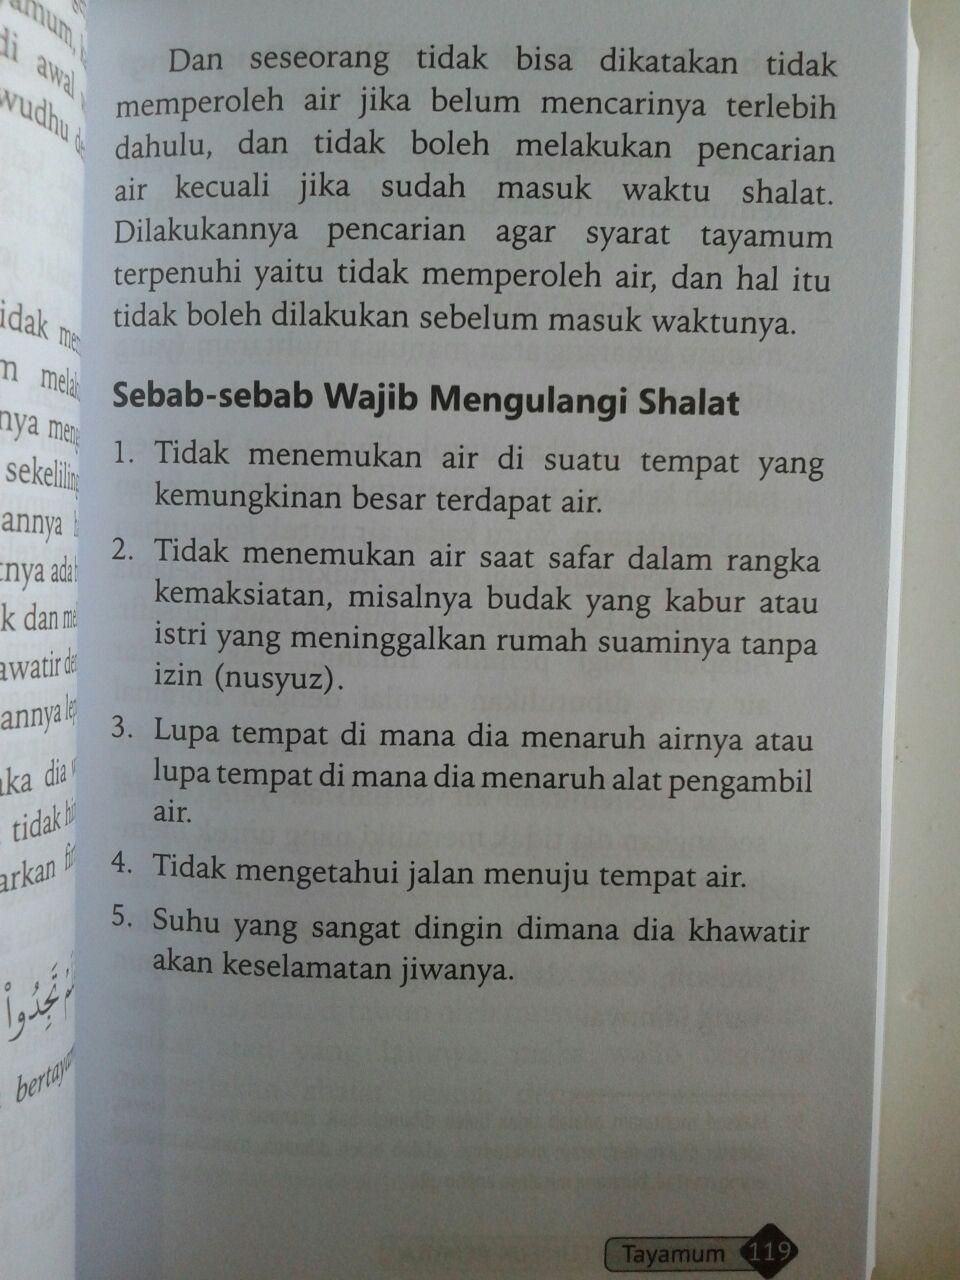 Buku Fikih Syafi'I Untuk Pemula Belajar Mudah Tingkat Dasar isi 2